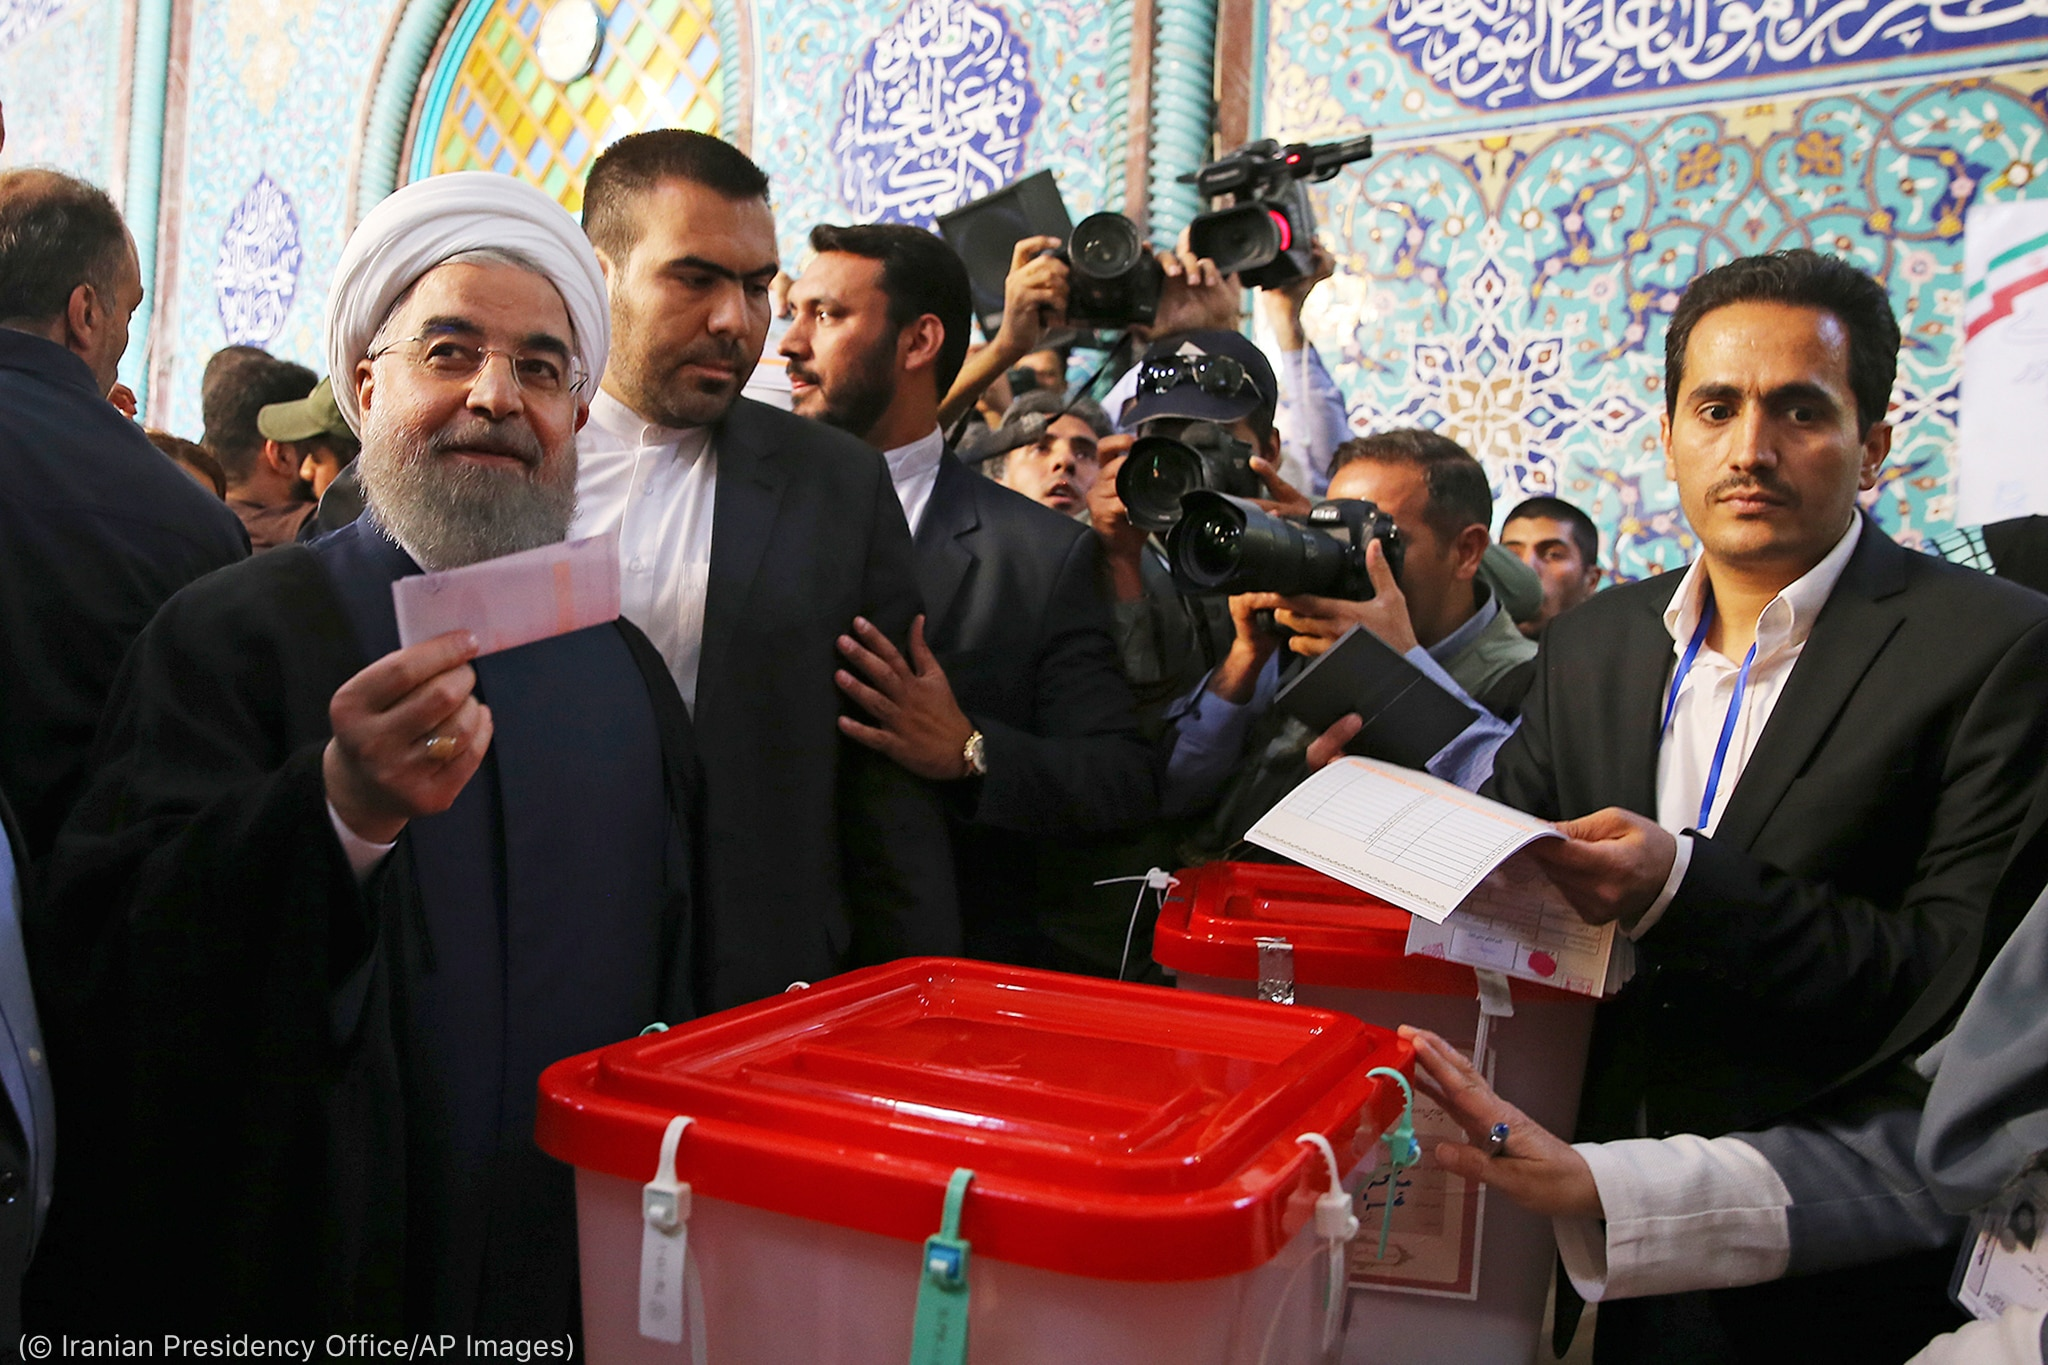 Rouhani holding ballot next to ballot box (© Iranian Presidency Office/AP Images)